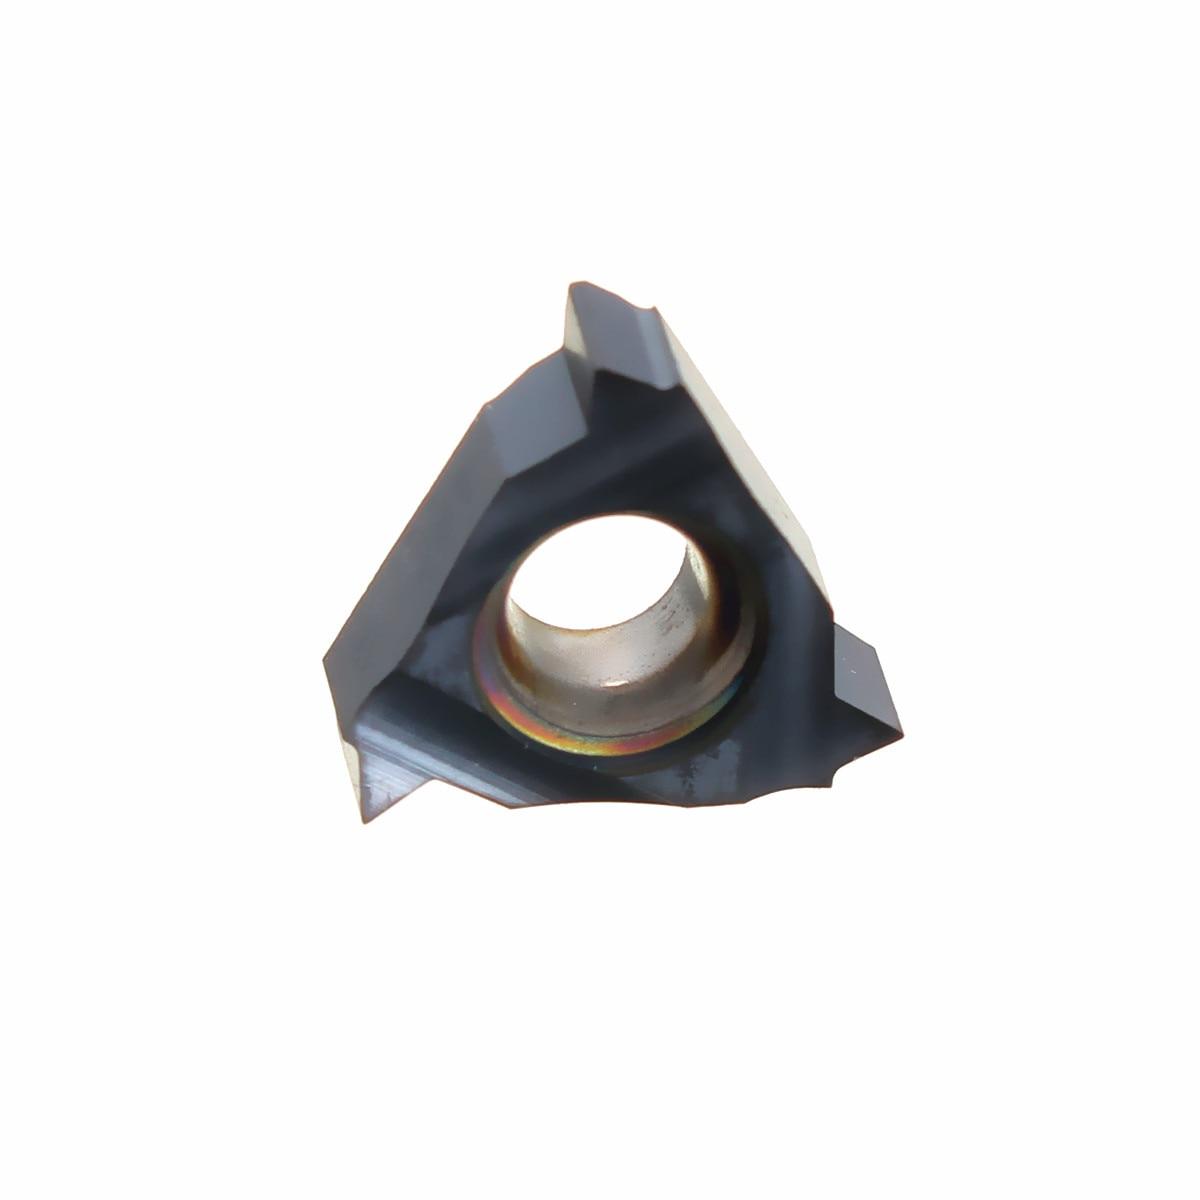 10pcs( 16ER 12UN SMX35 ) Carbide Insert For Threading Turning Tool Boring BAR